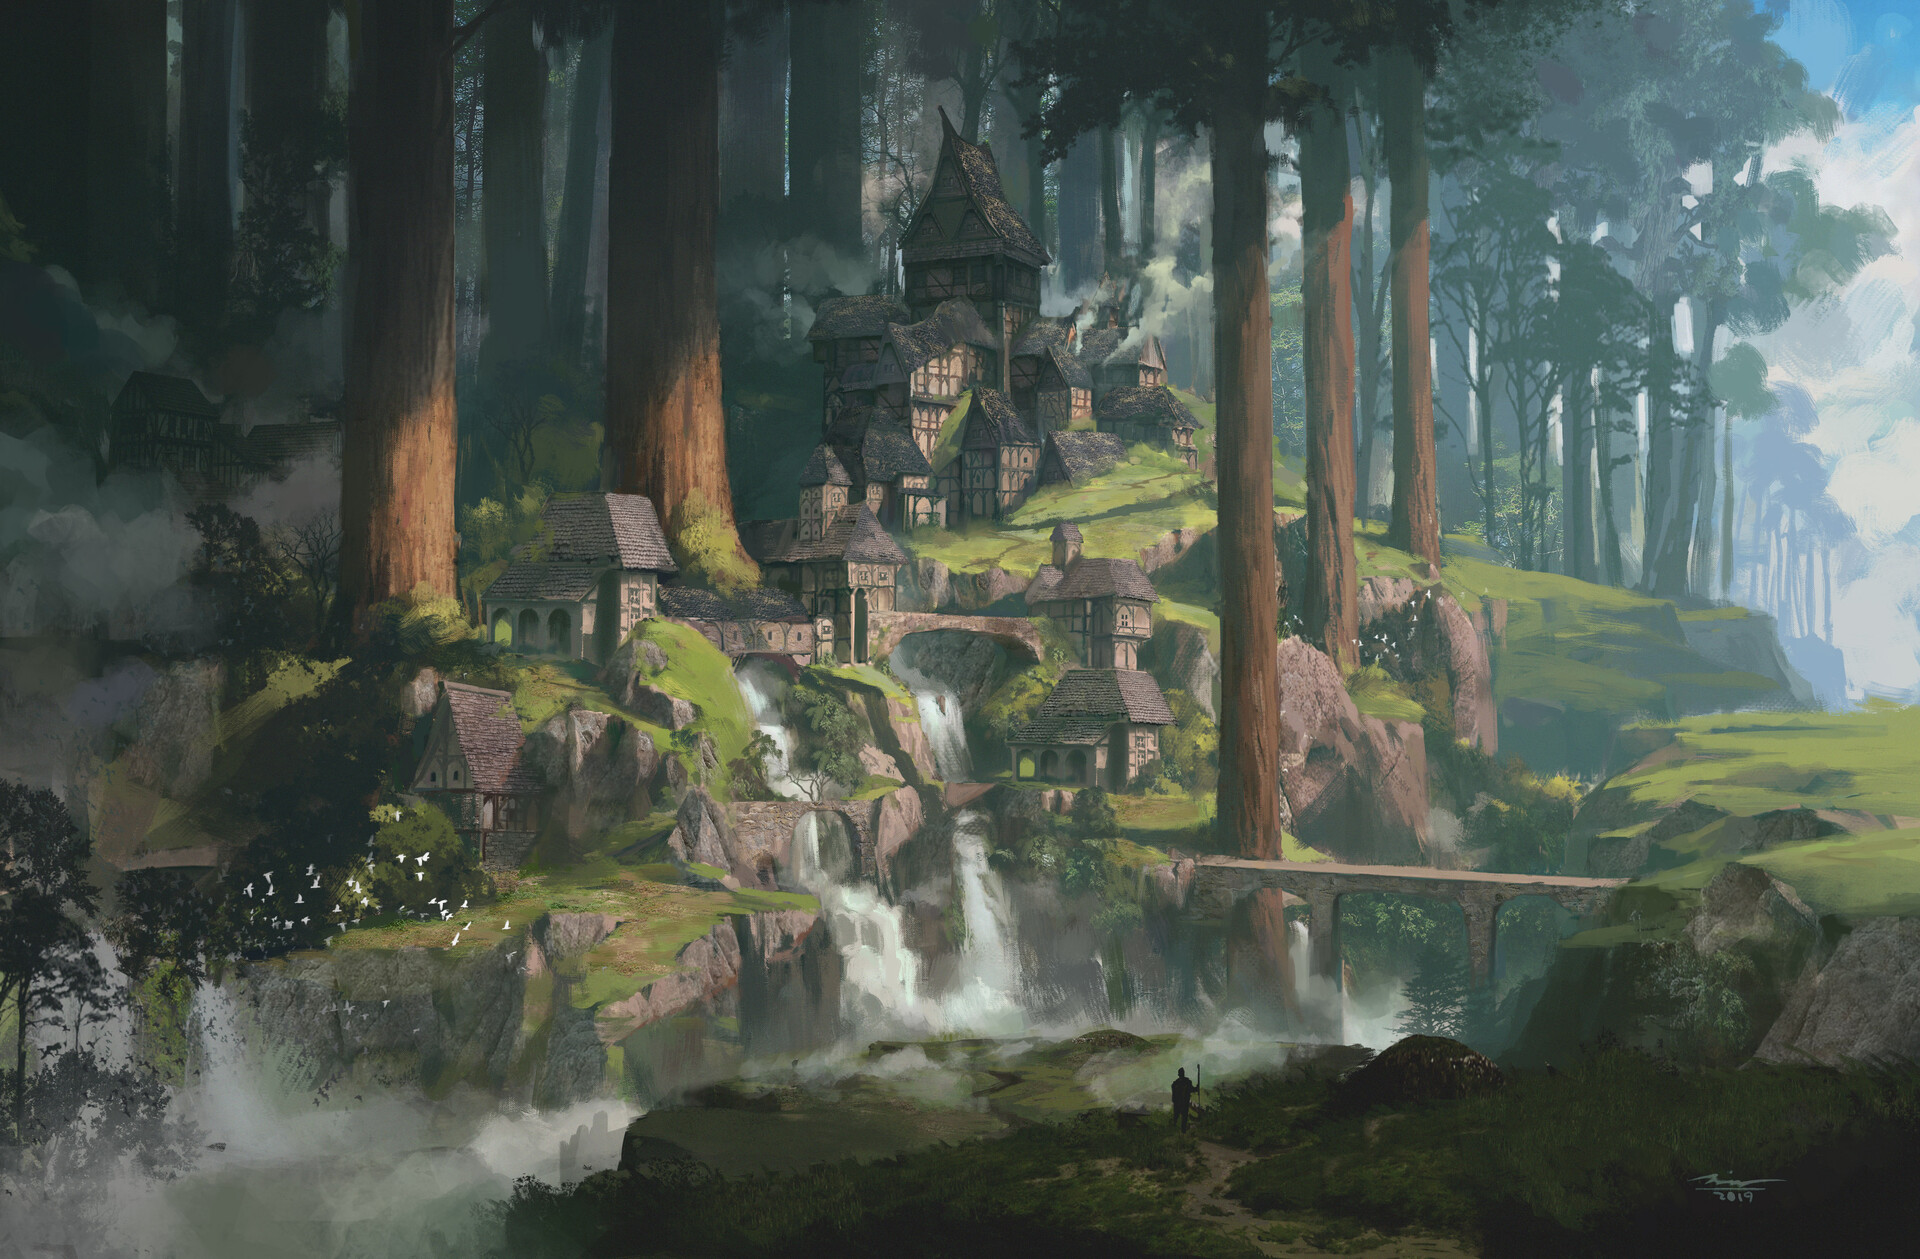 General 1920x1259 Sina Abbasnia city fantasy art village trees landscape artwork